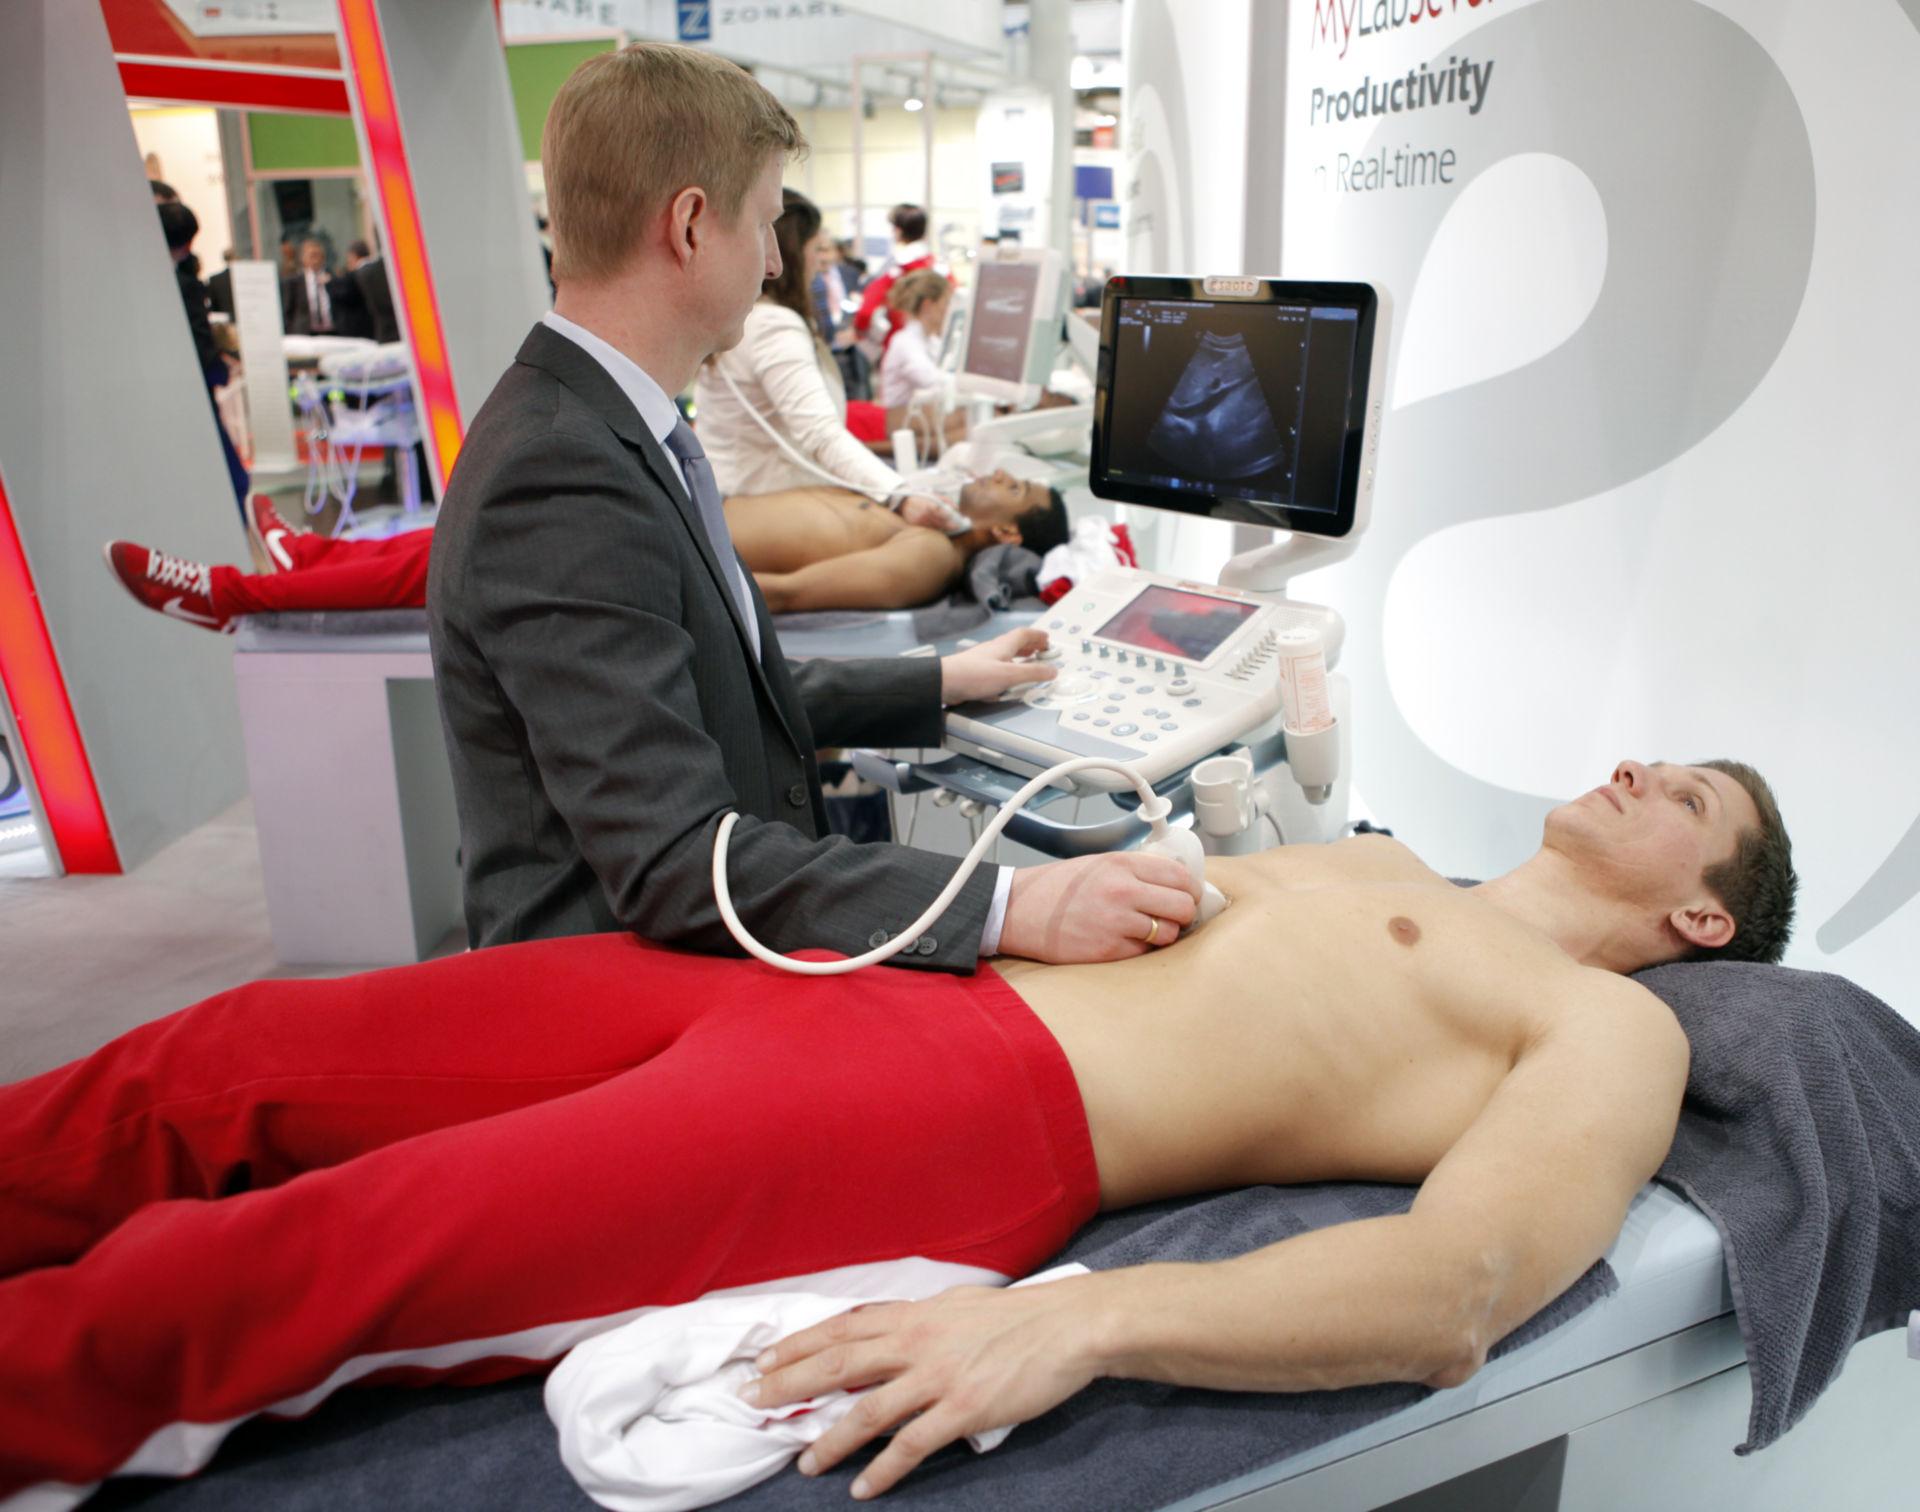 Ultrasound device (demonstration) - Sonography